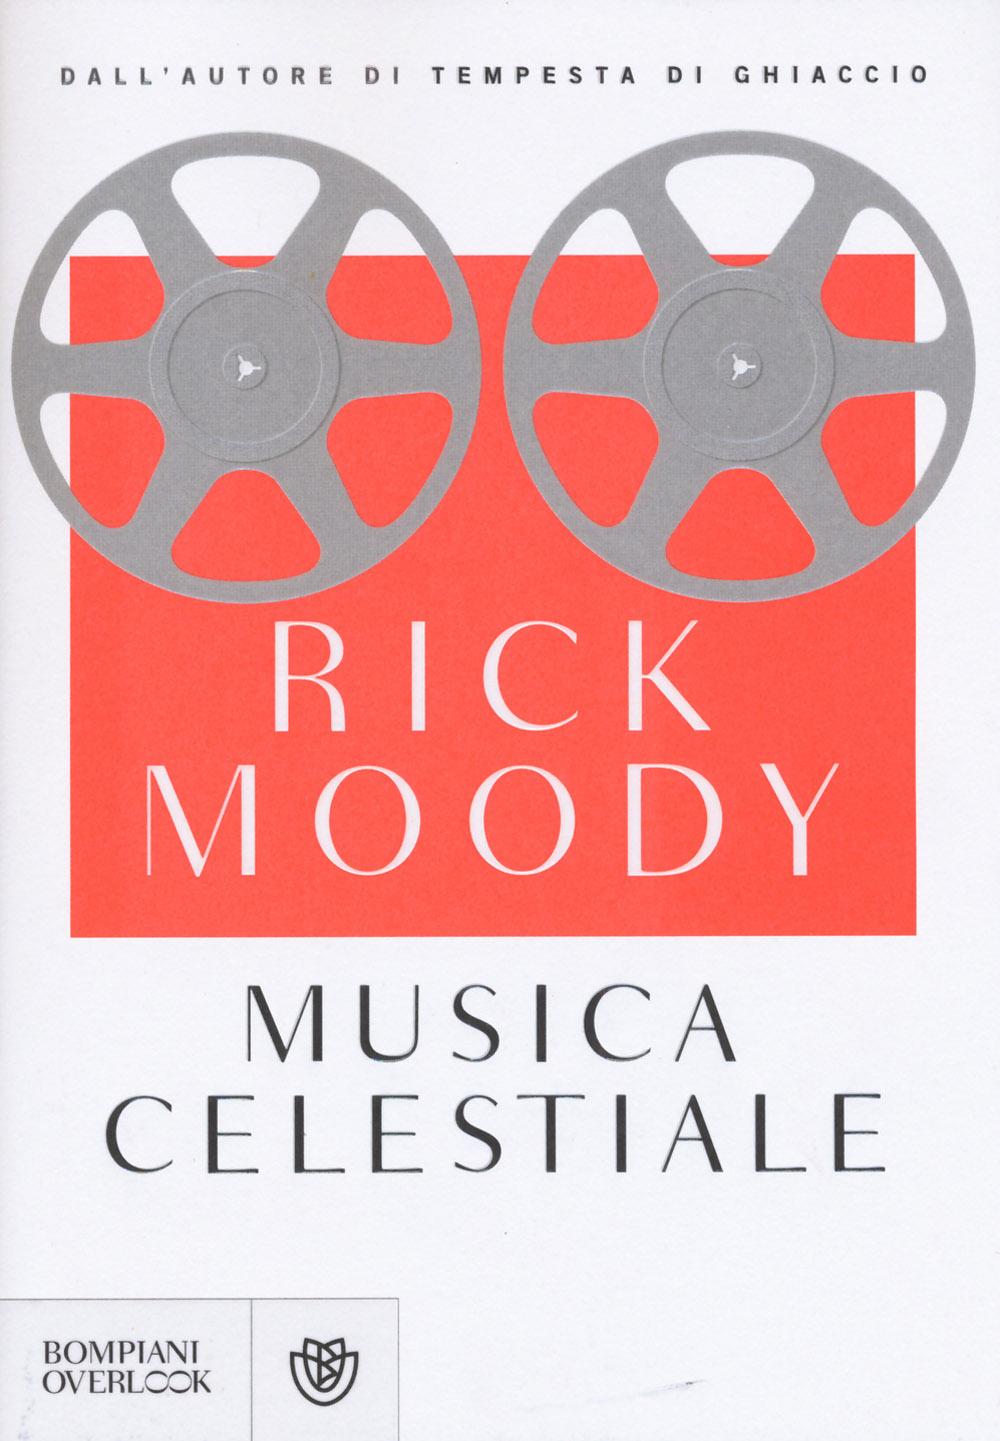 Musica celestiale